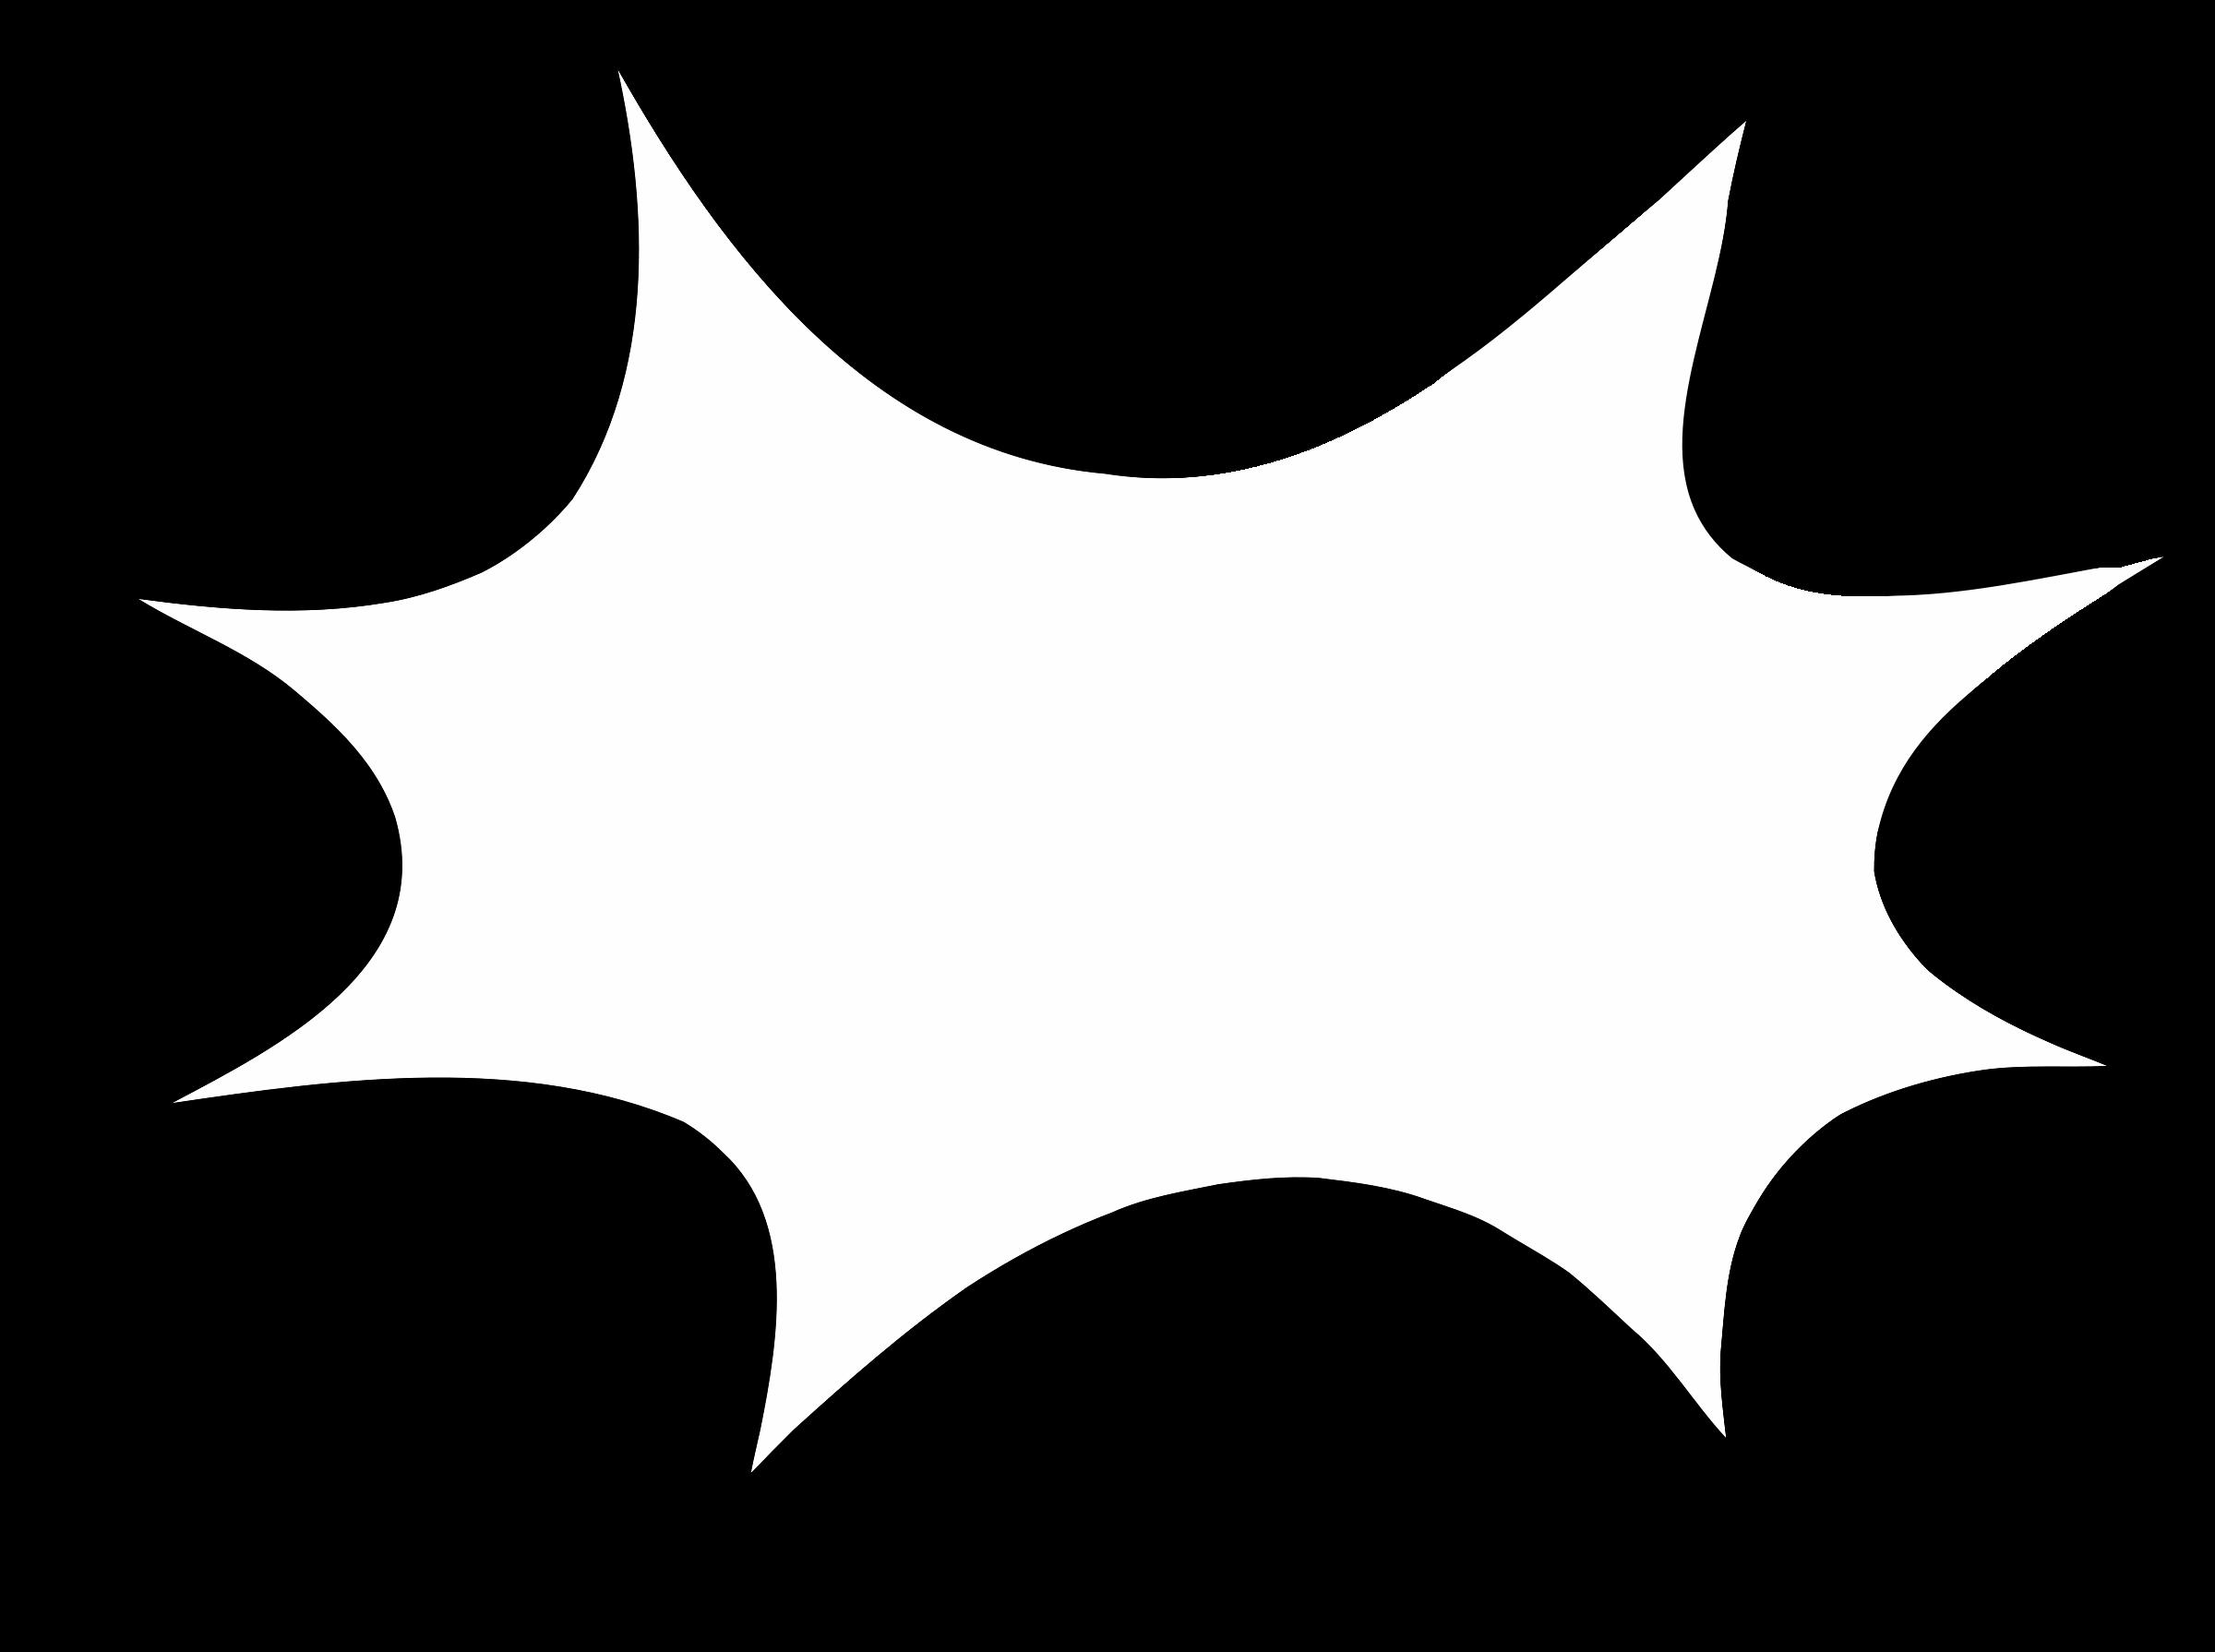 2400x1790 Black And White Starburst Clipart